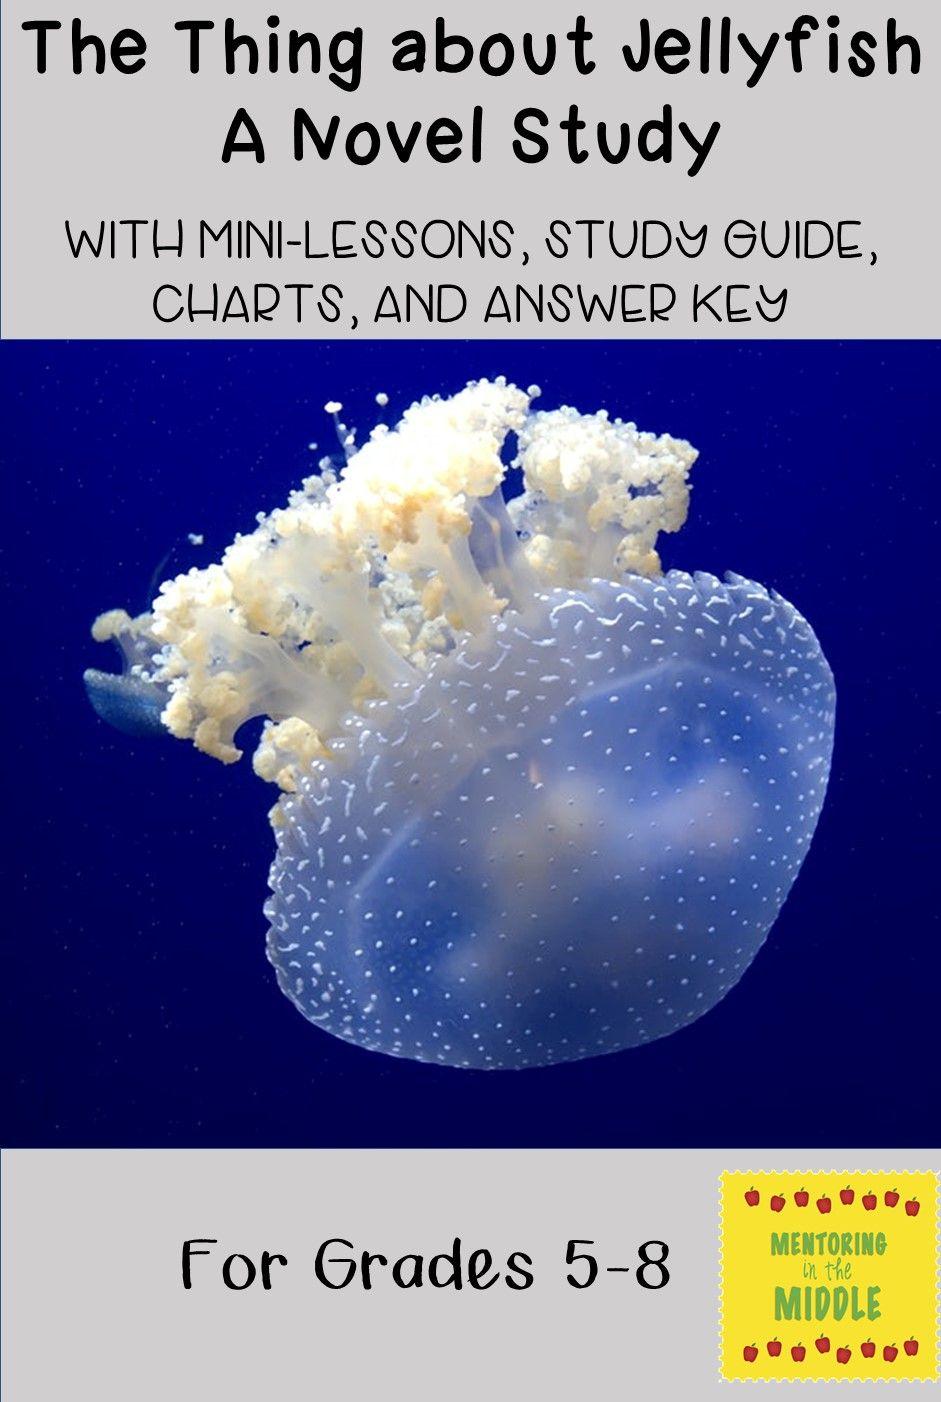 the thing about jellyfish novel unit study guide teacher lesson rh pinterest com Marine Invertebrates List Marine Invertebrate Genera